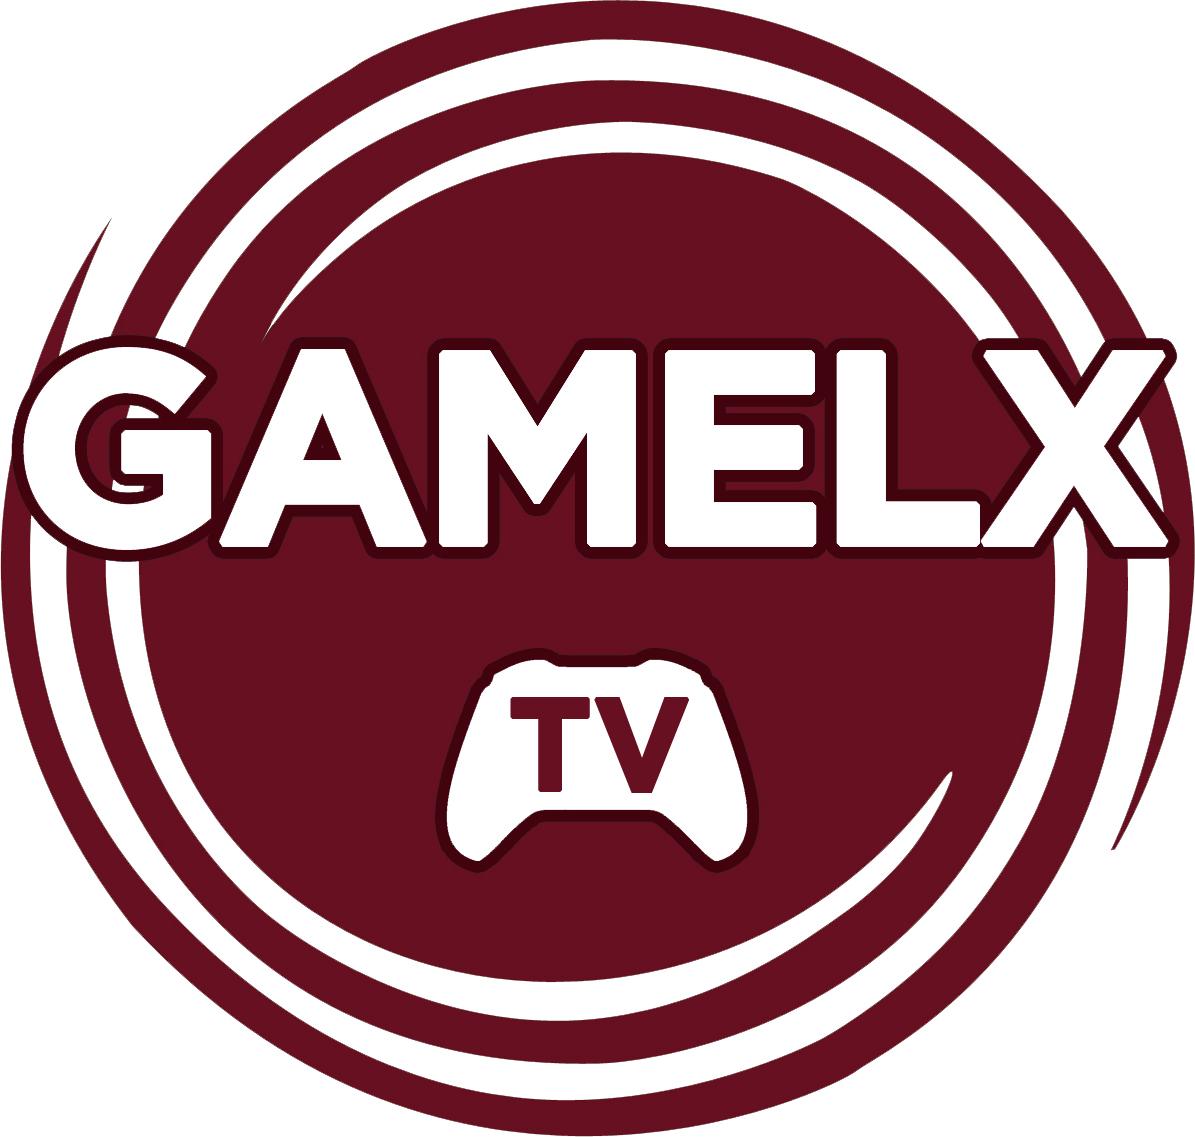 GAMELX TV